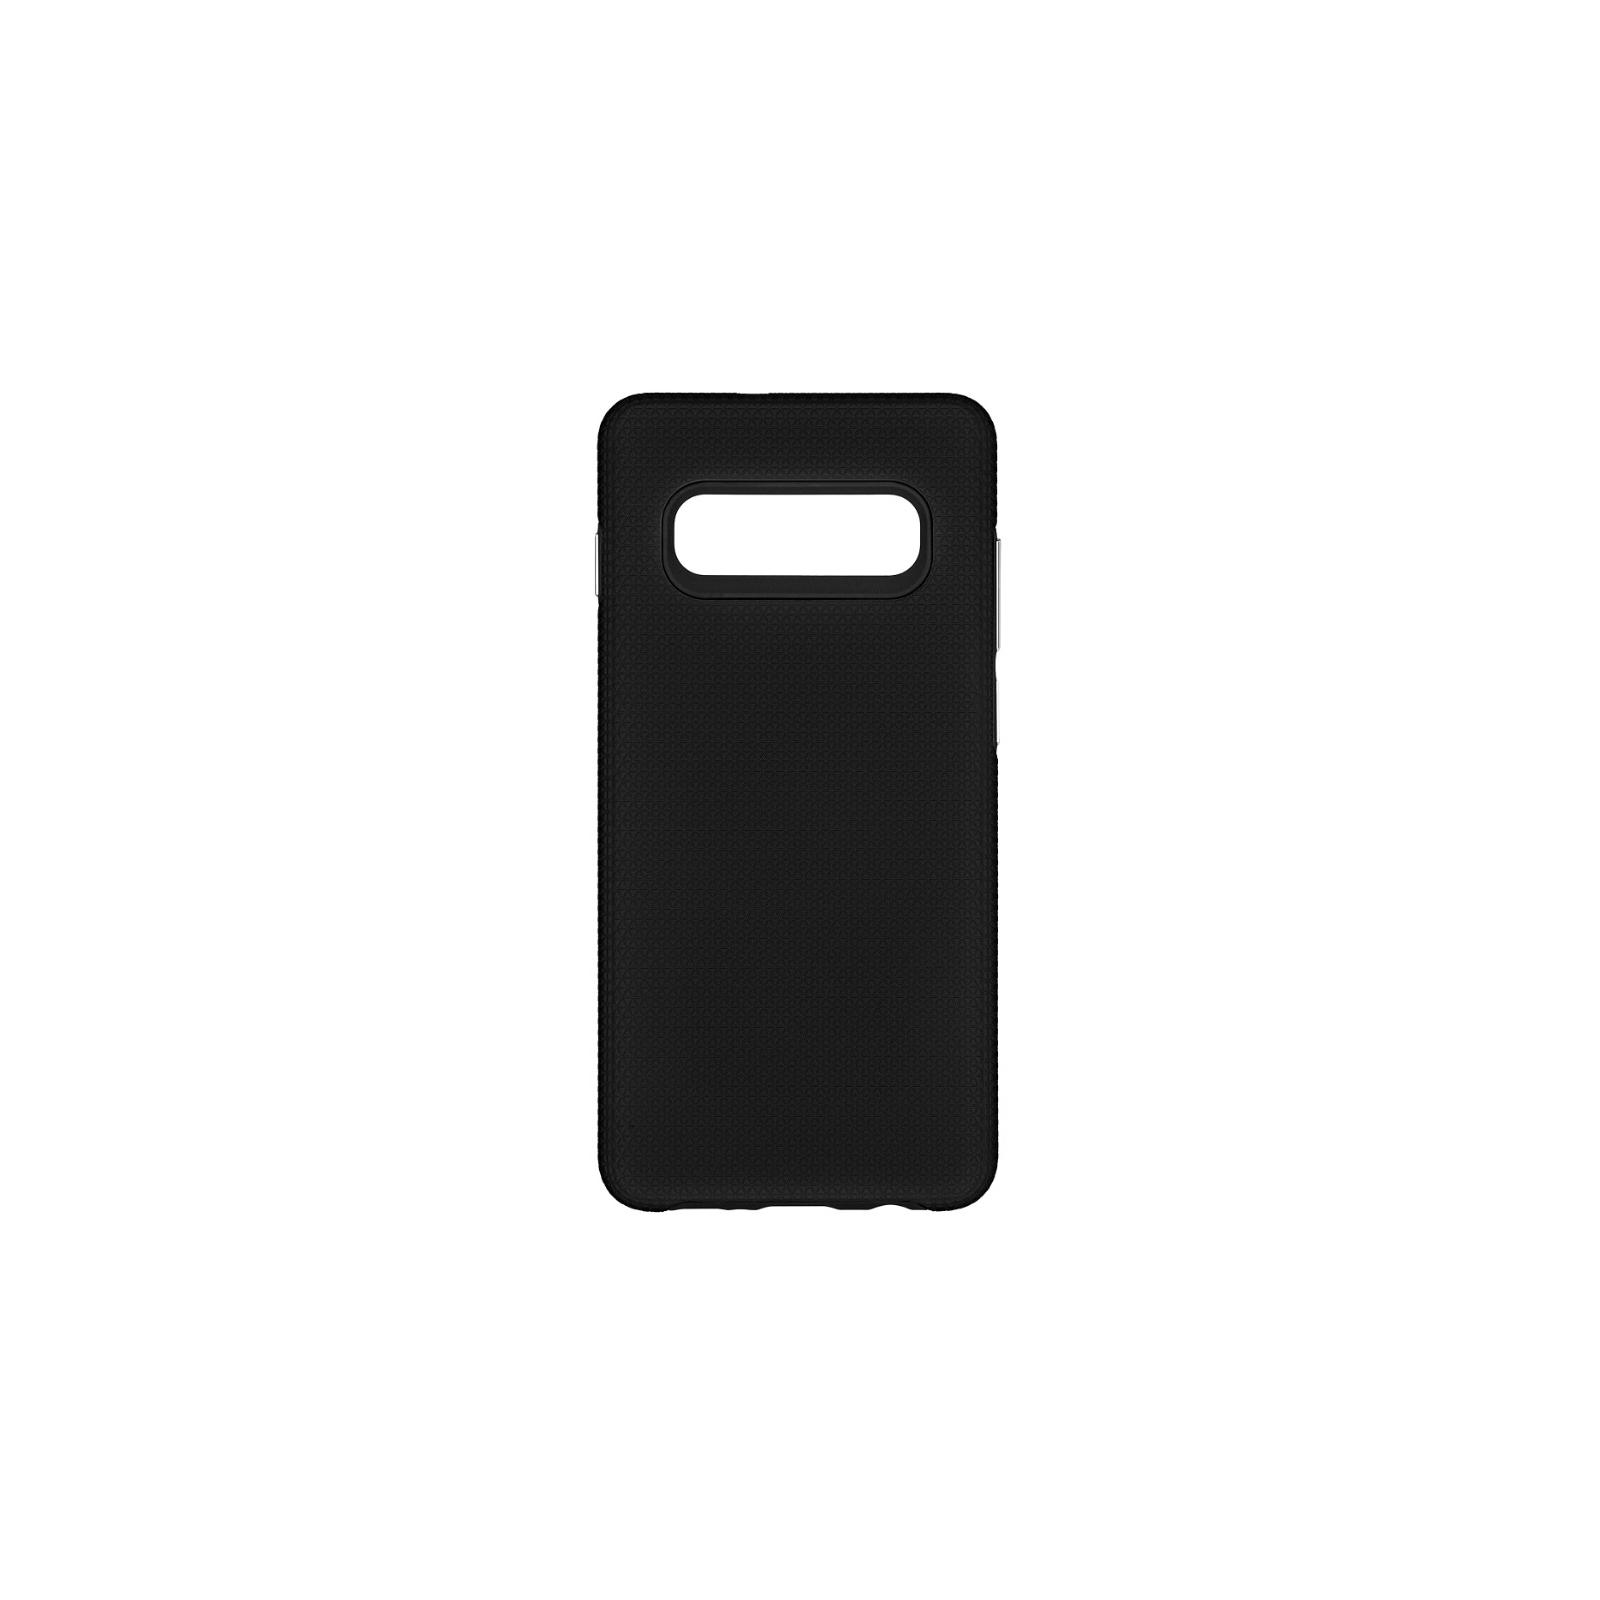 Чохол до моб. телефона 2E Samsung Galaxy S10, Triangle, Black (2E-G-S10-TKTLBK)